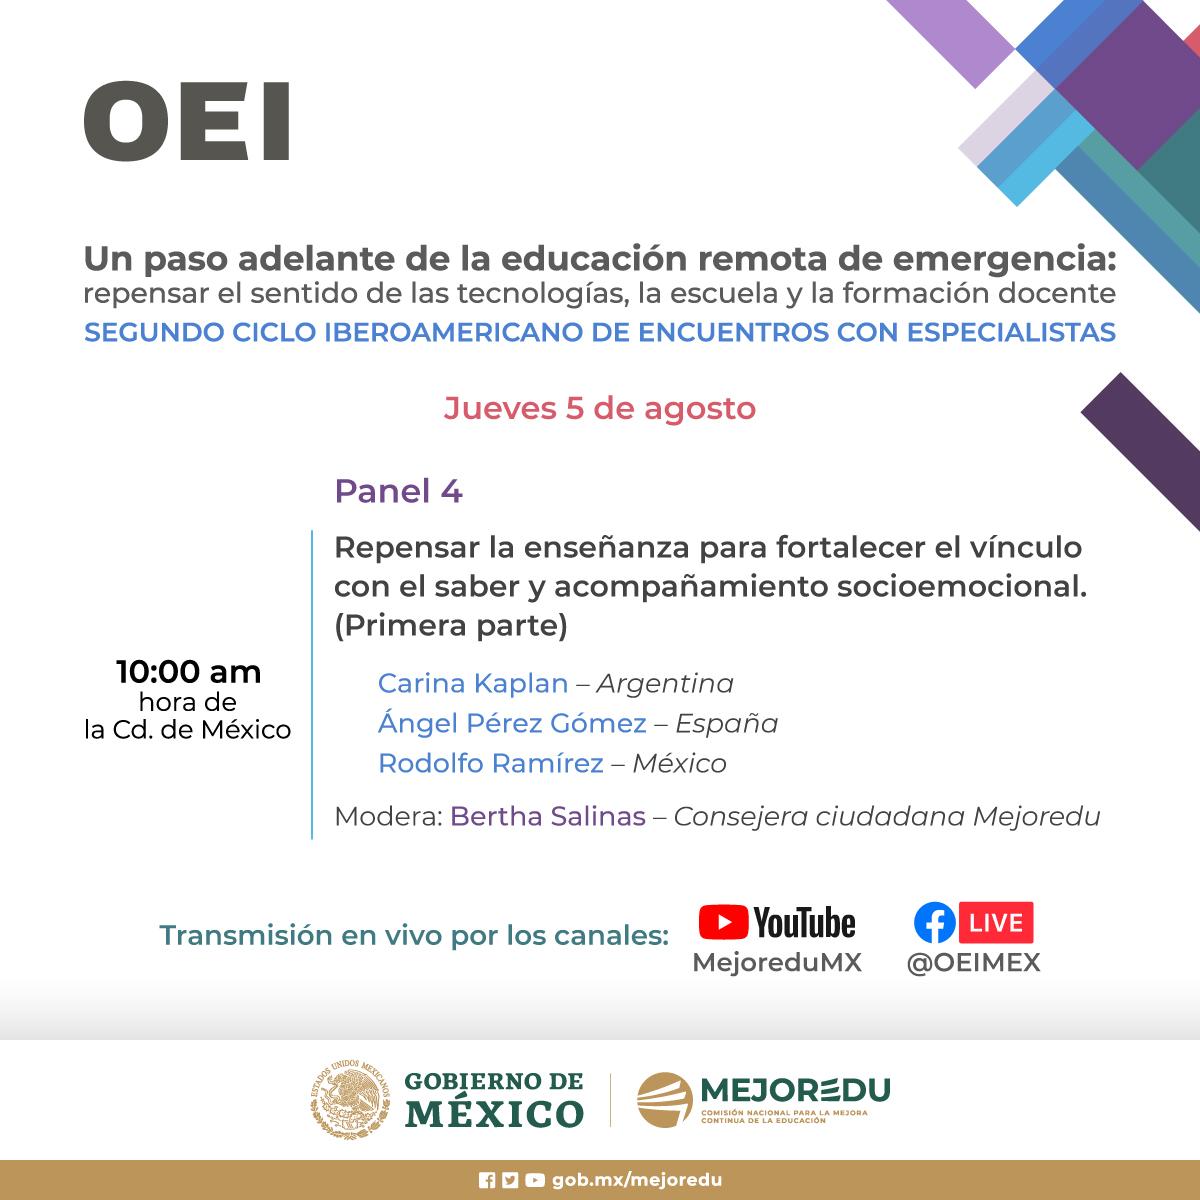 Panel 4 Segundo Ciclo Iberoamericano